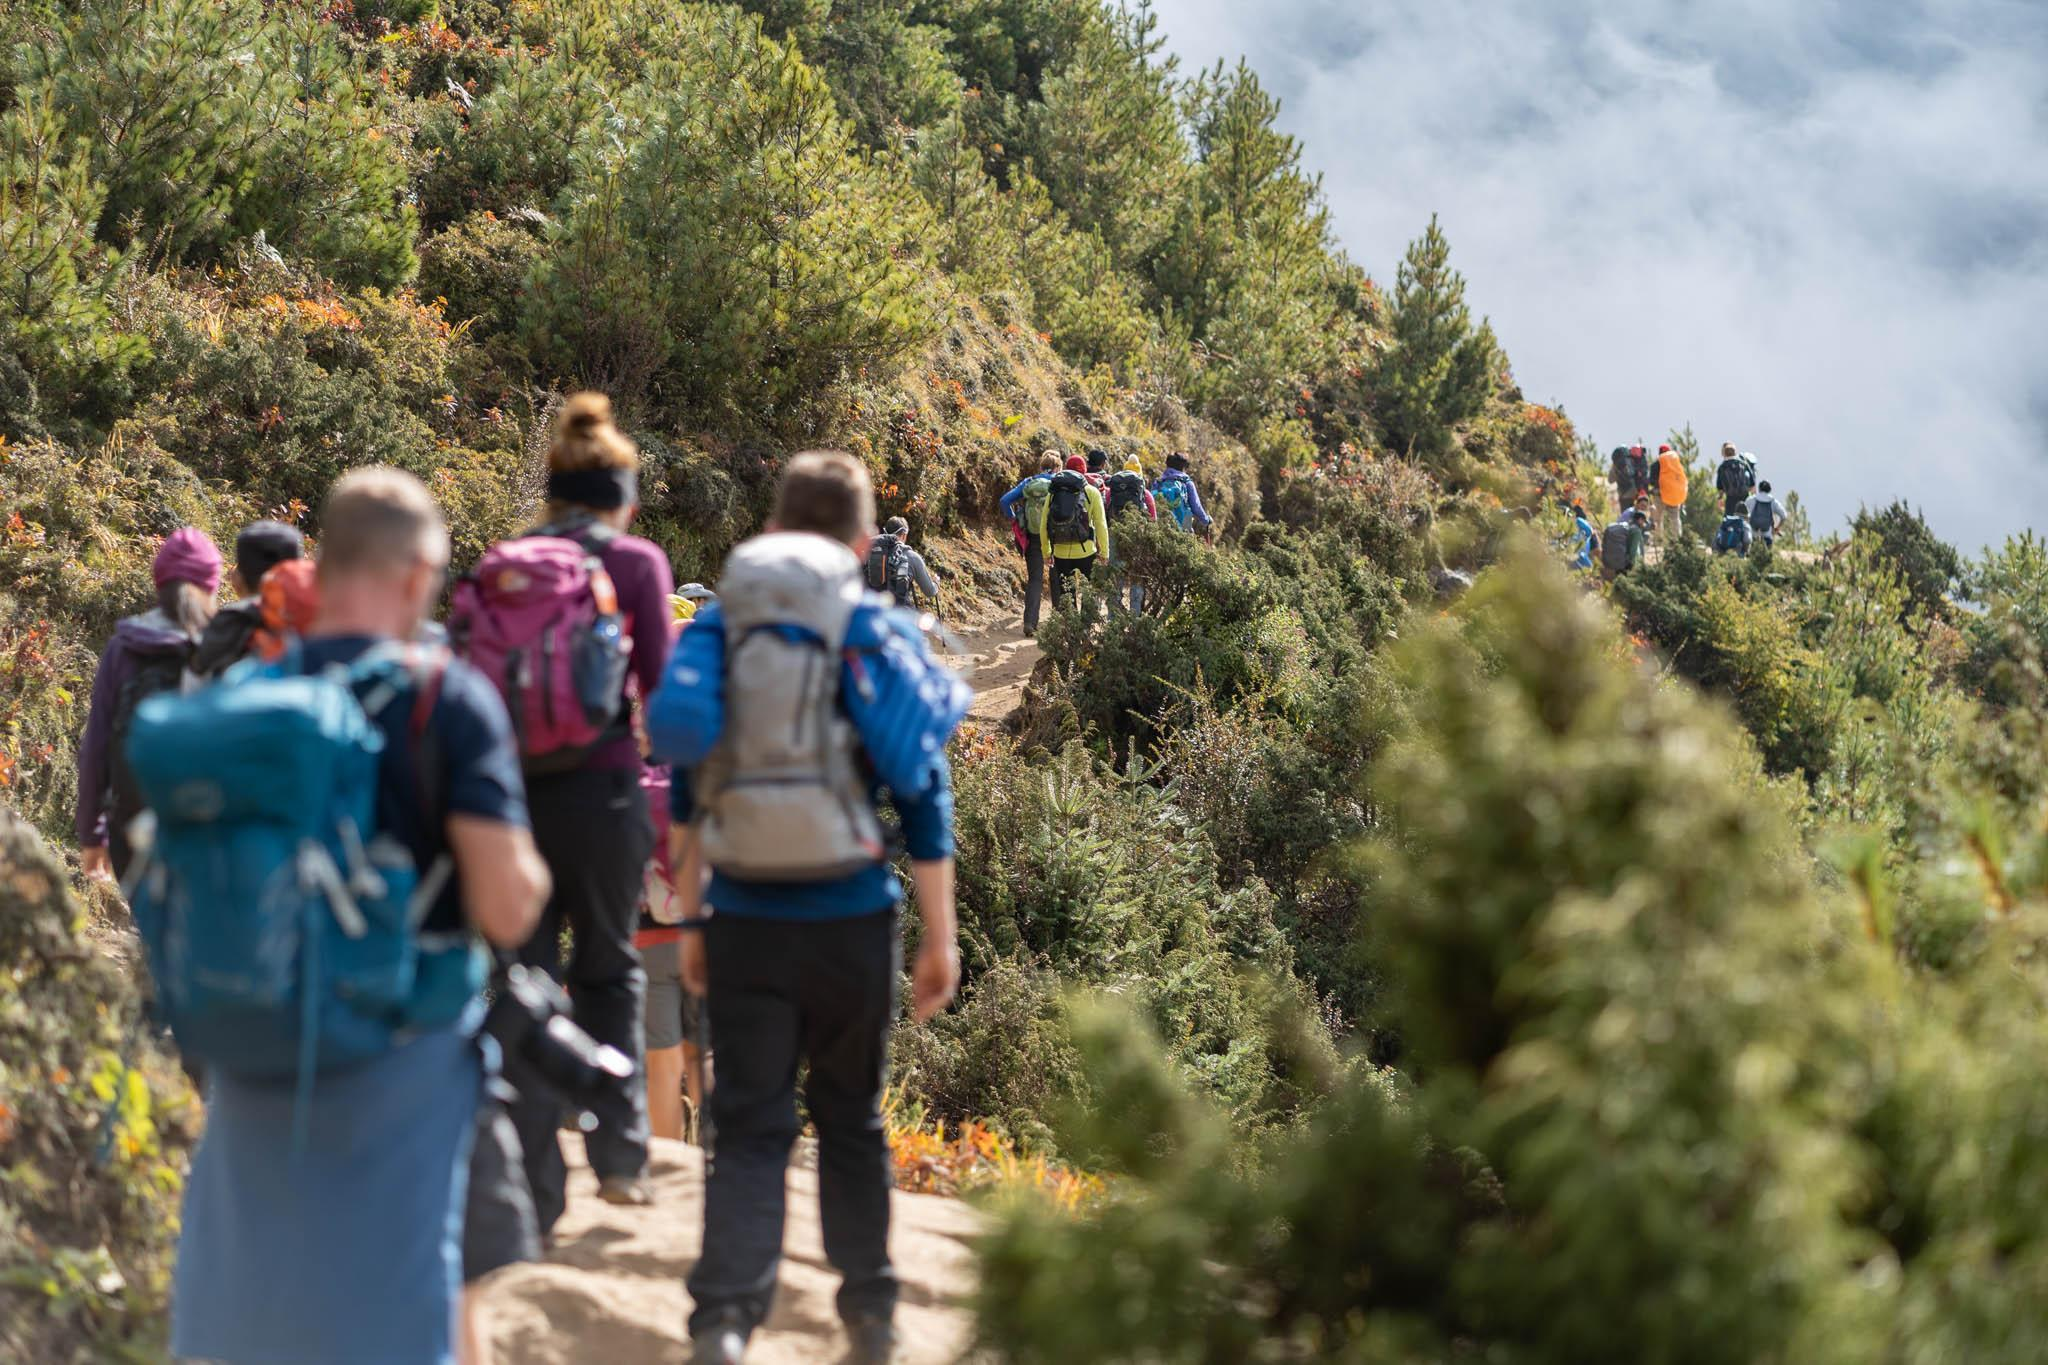 A Bucket List group on a mountain trail